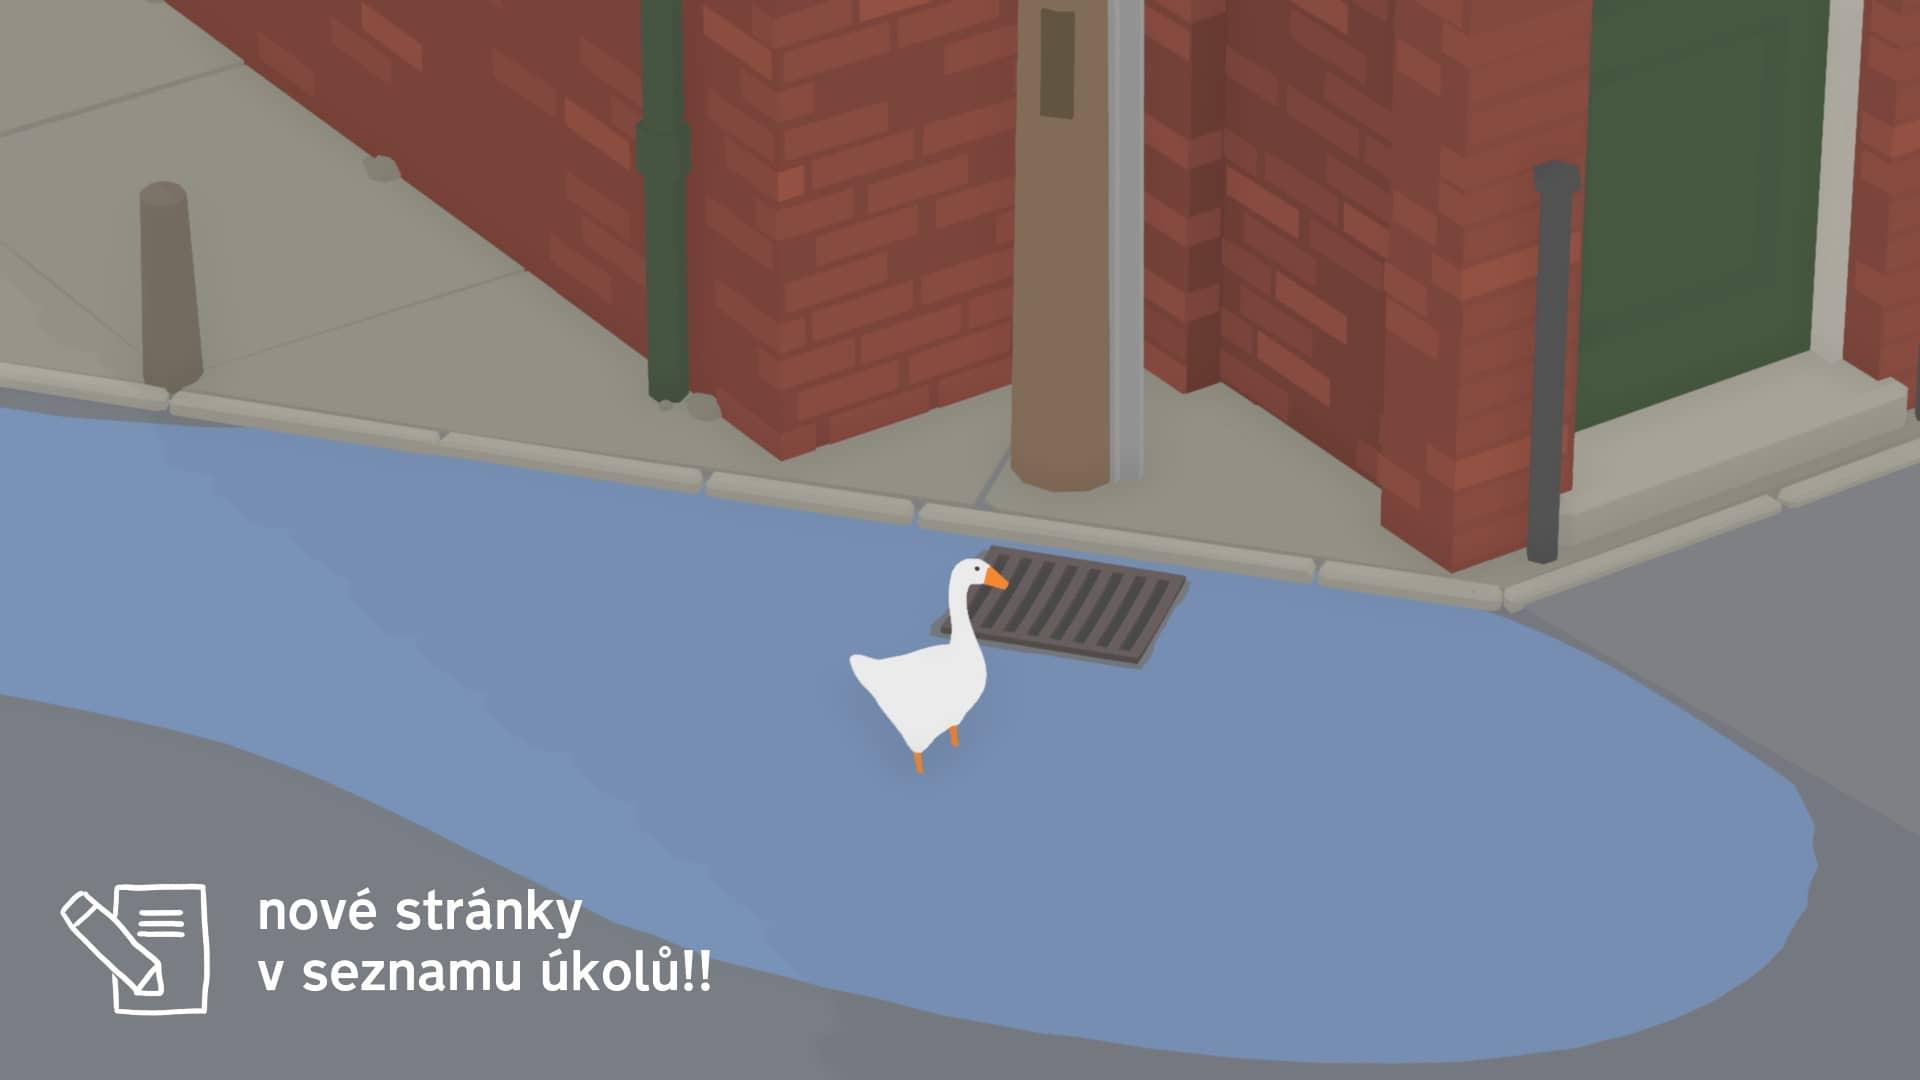 Untitled Goose Game - Položka